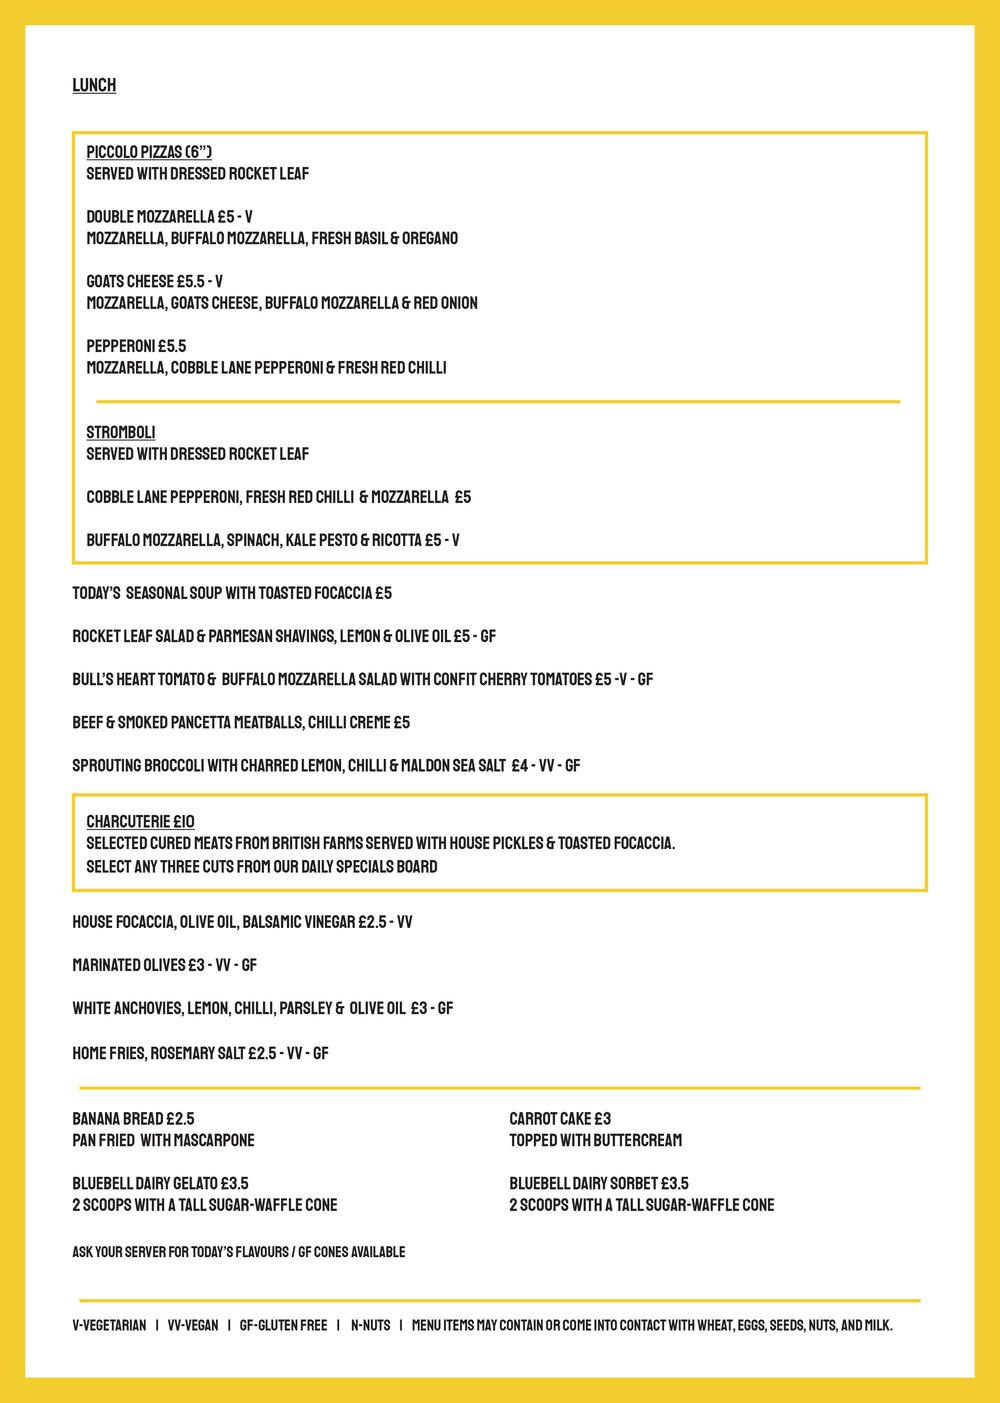 HC_Lunch-menu.jpg